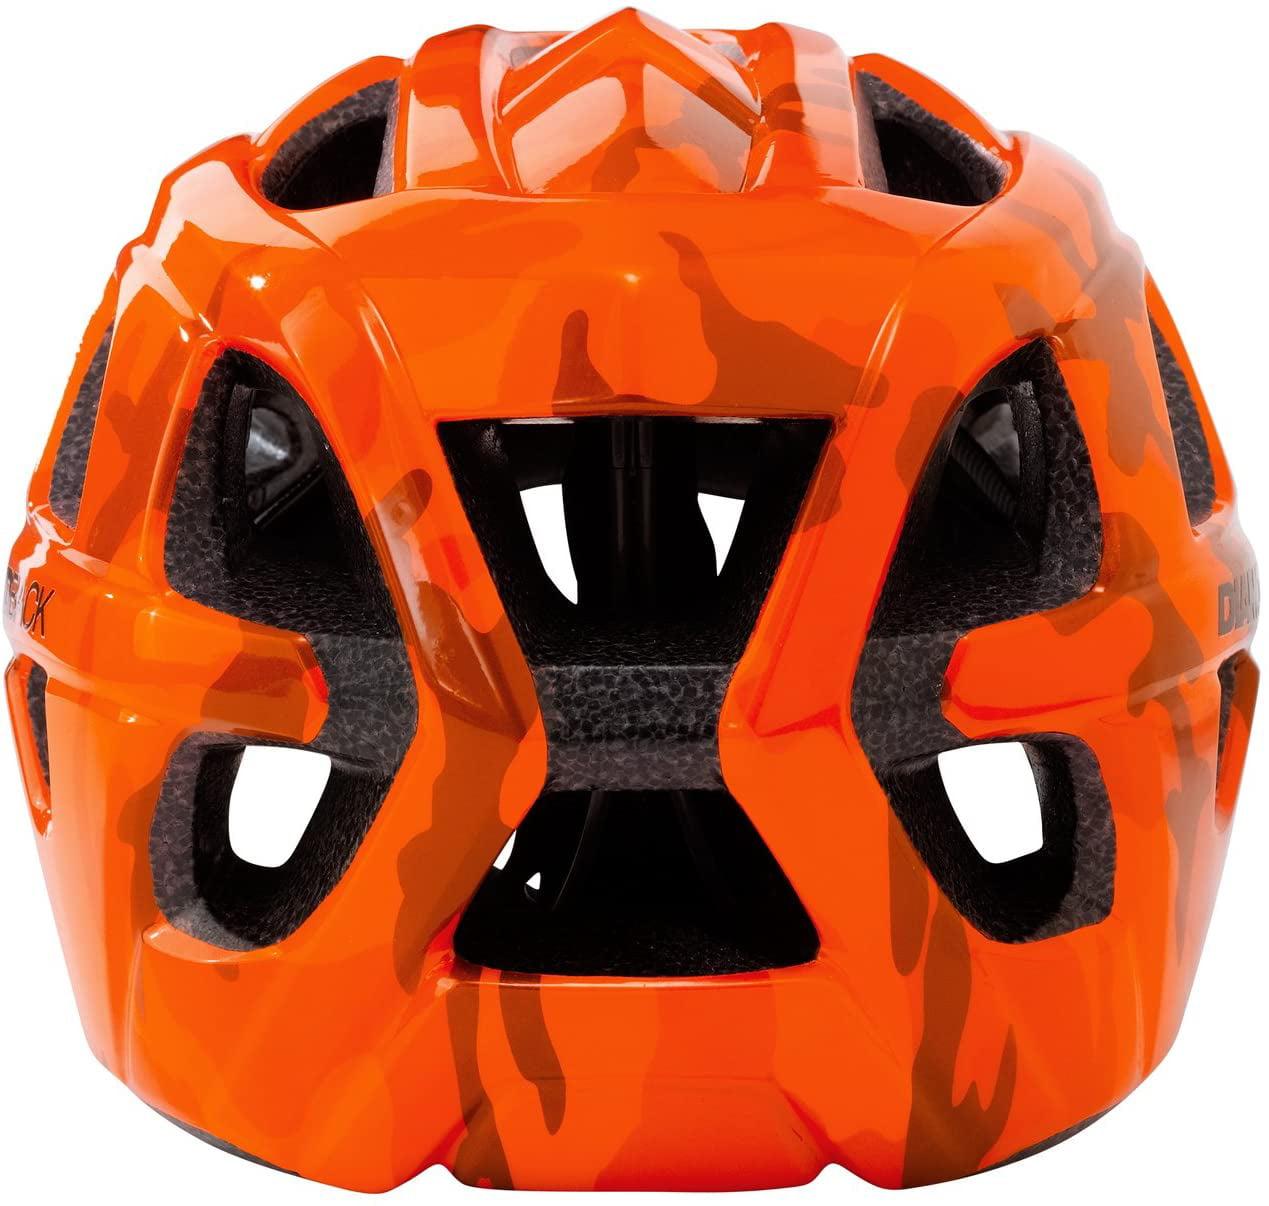 Orange Diamondback 88-32-016 Octane Youth Bike Helmet,Fits Heads from 49-52cm